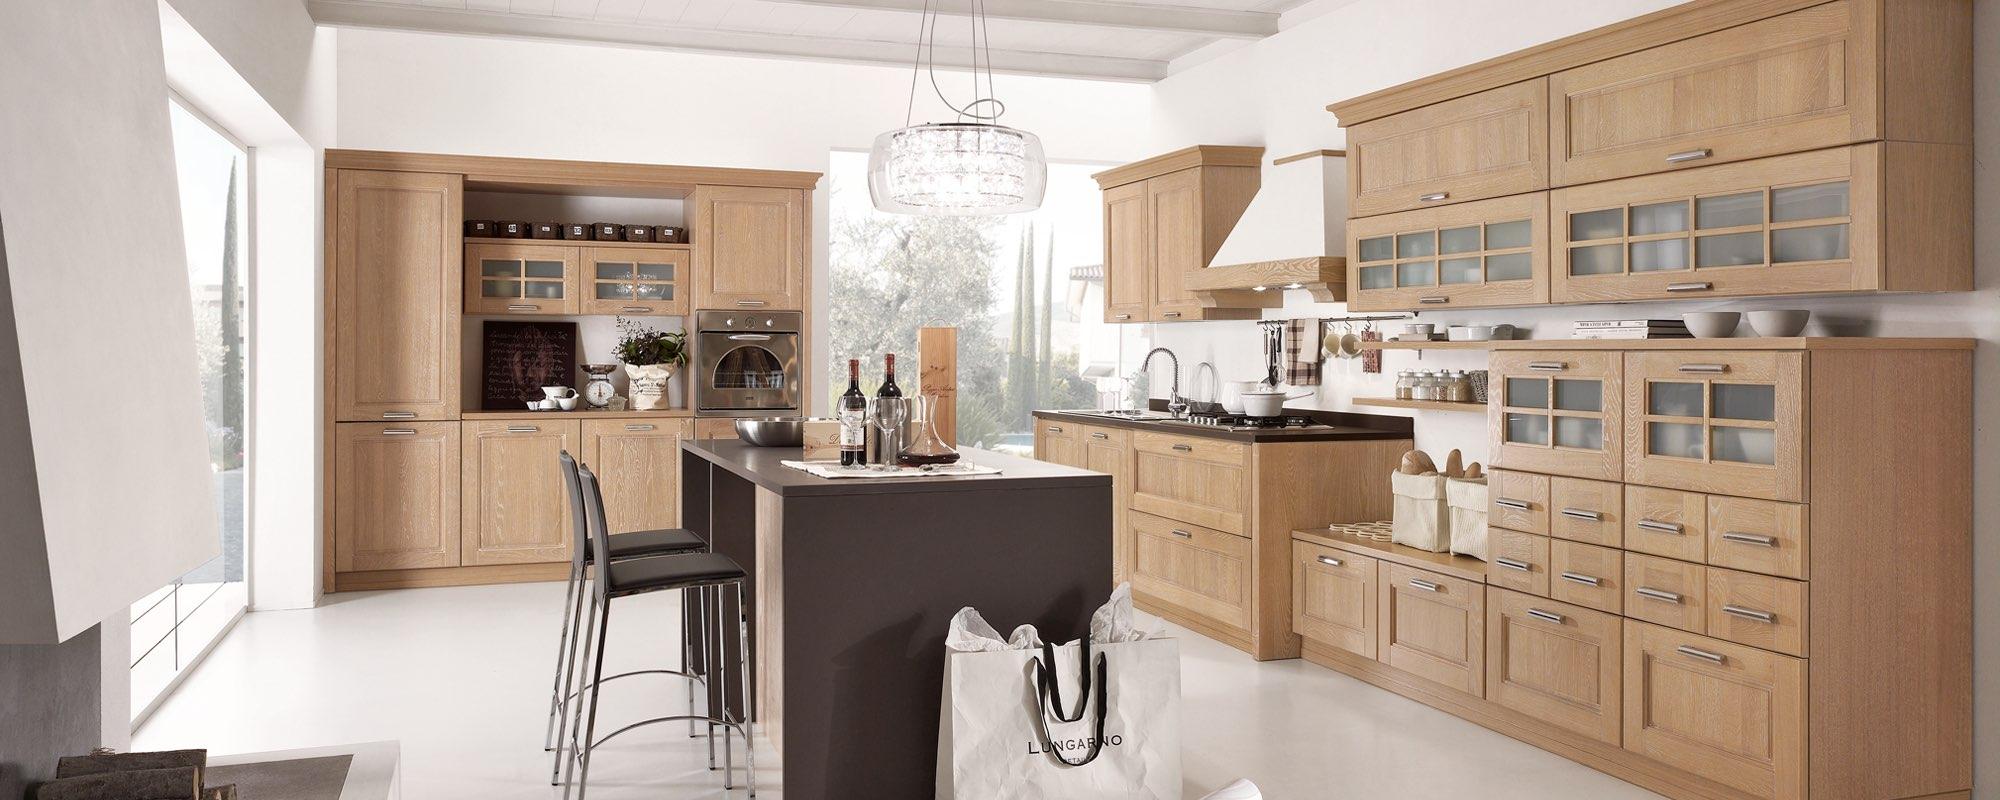 cucina stosa contemporanea con tavolo in legno e sedie - modello cucina ONTARIO